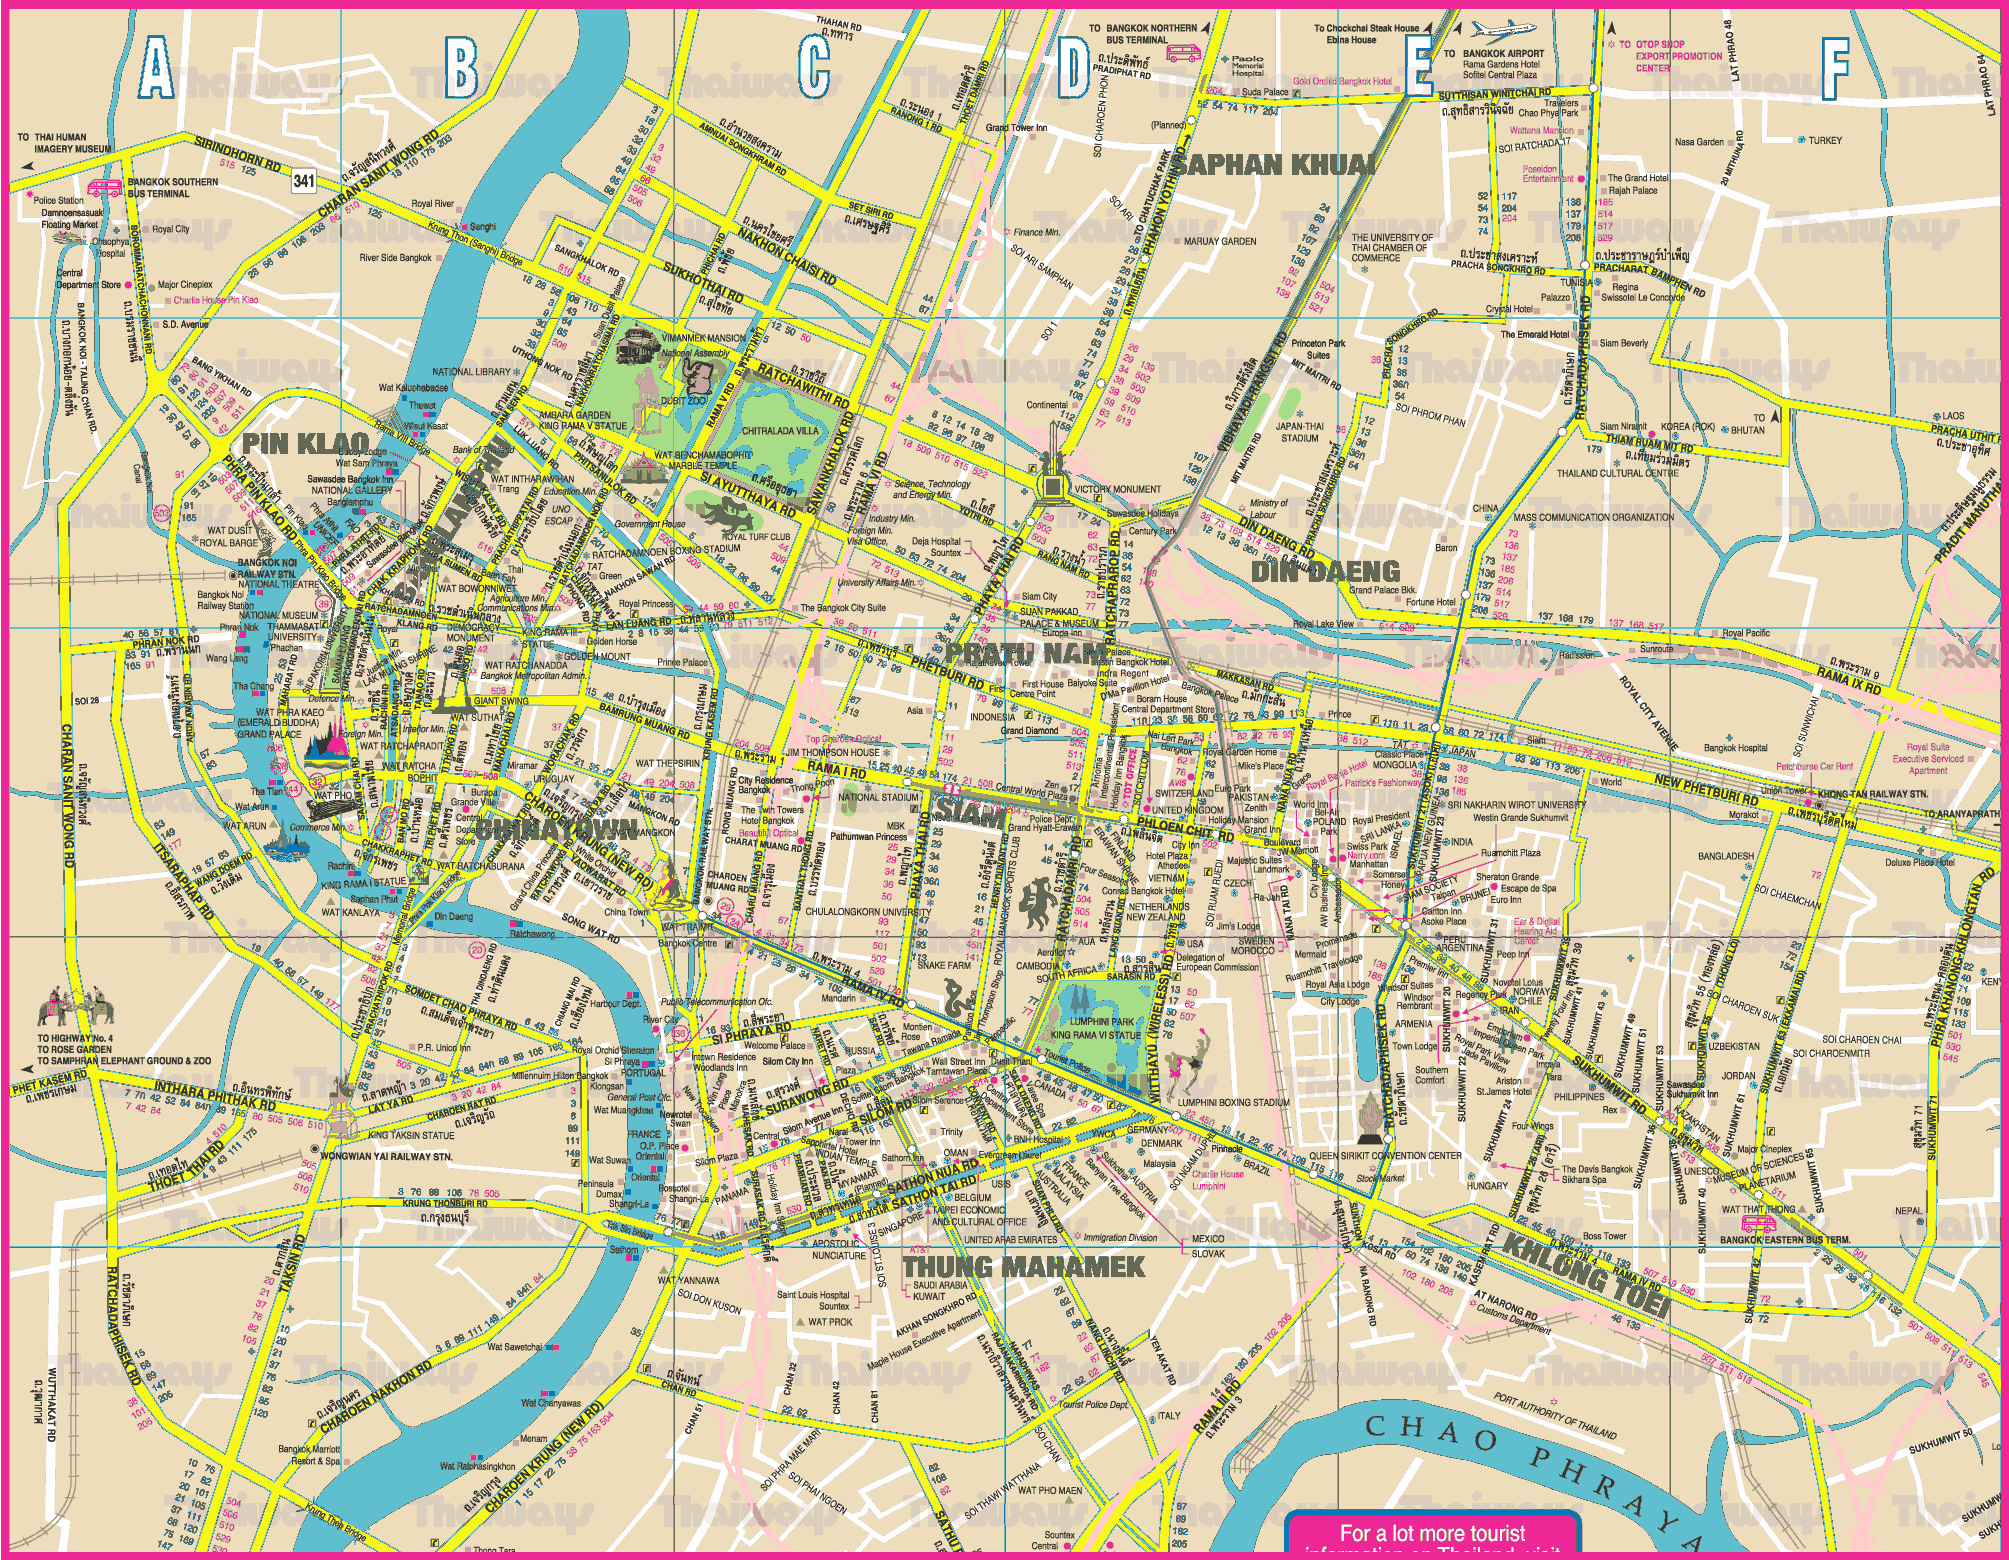 Bangkok Tourist Map Bangkok Thailand mappery